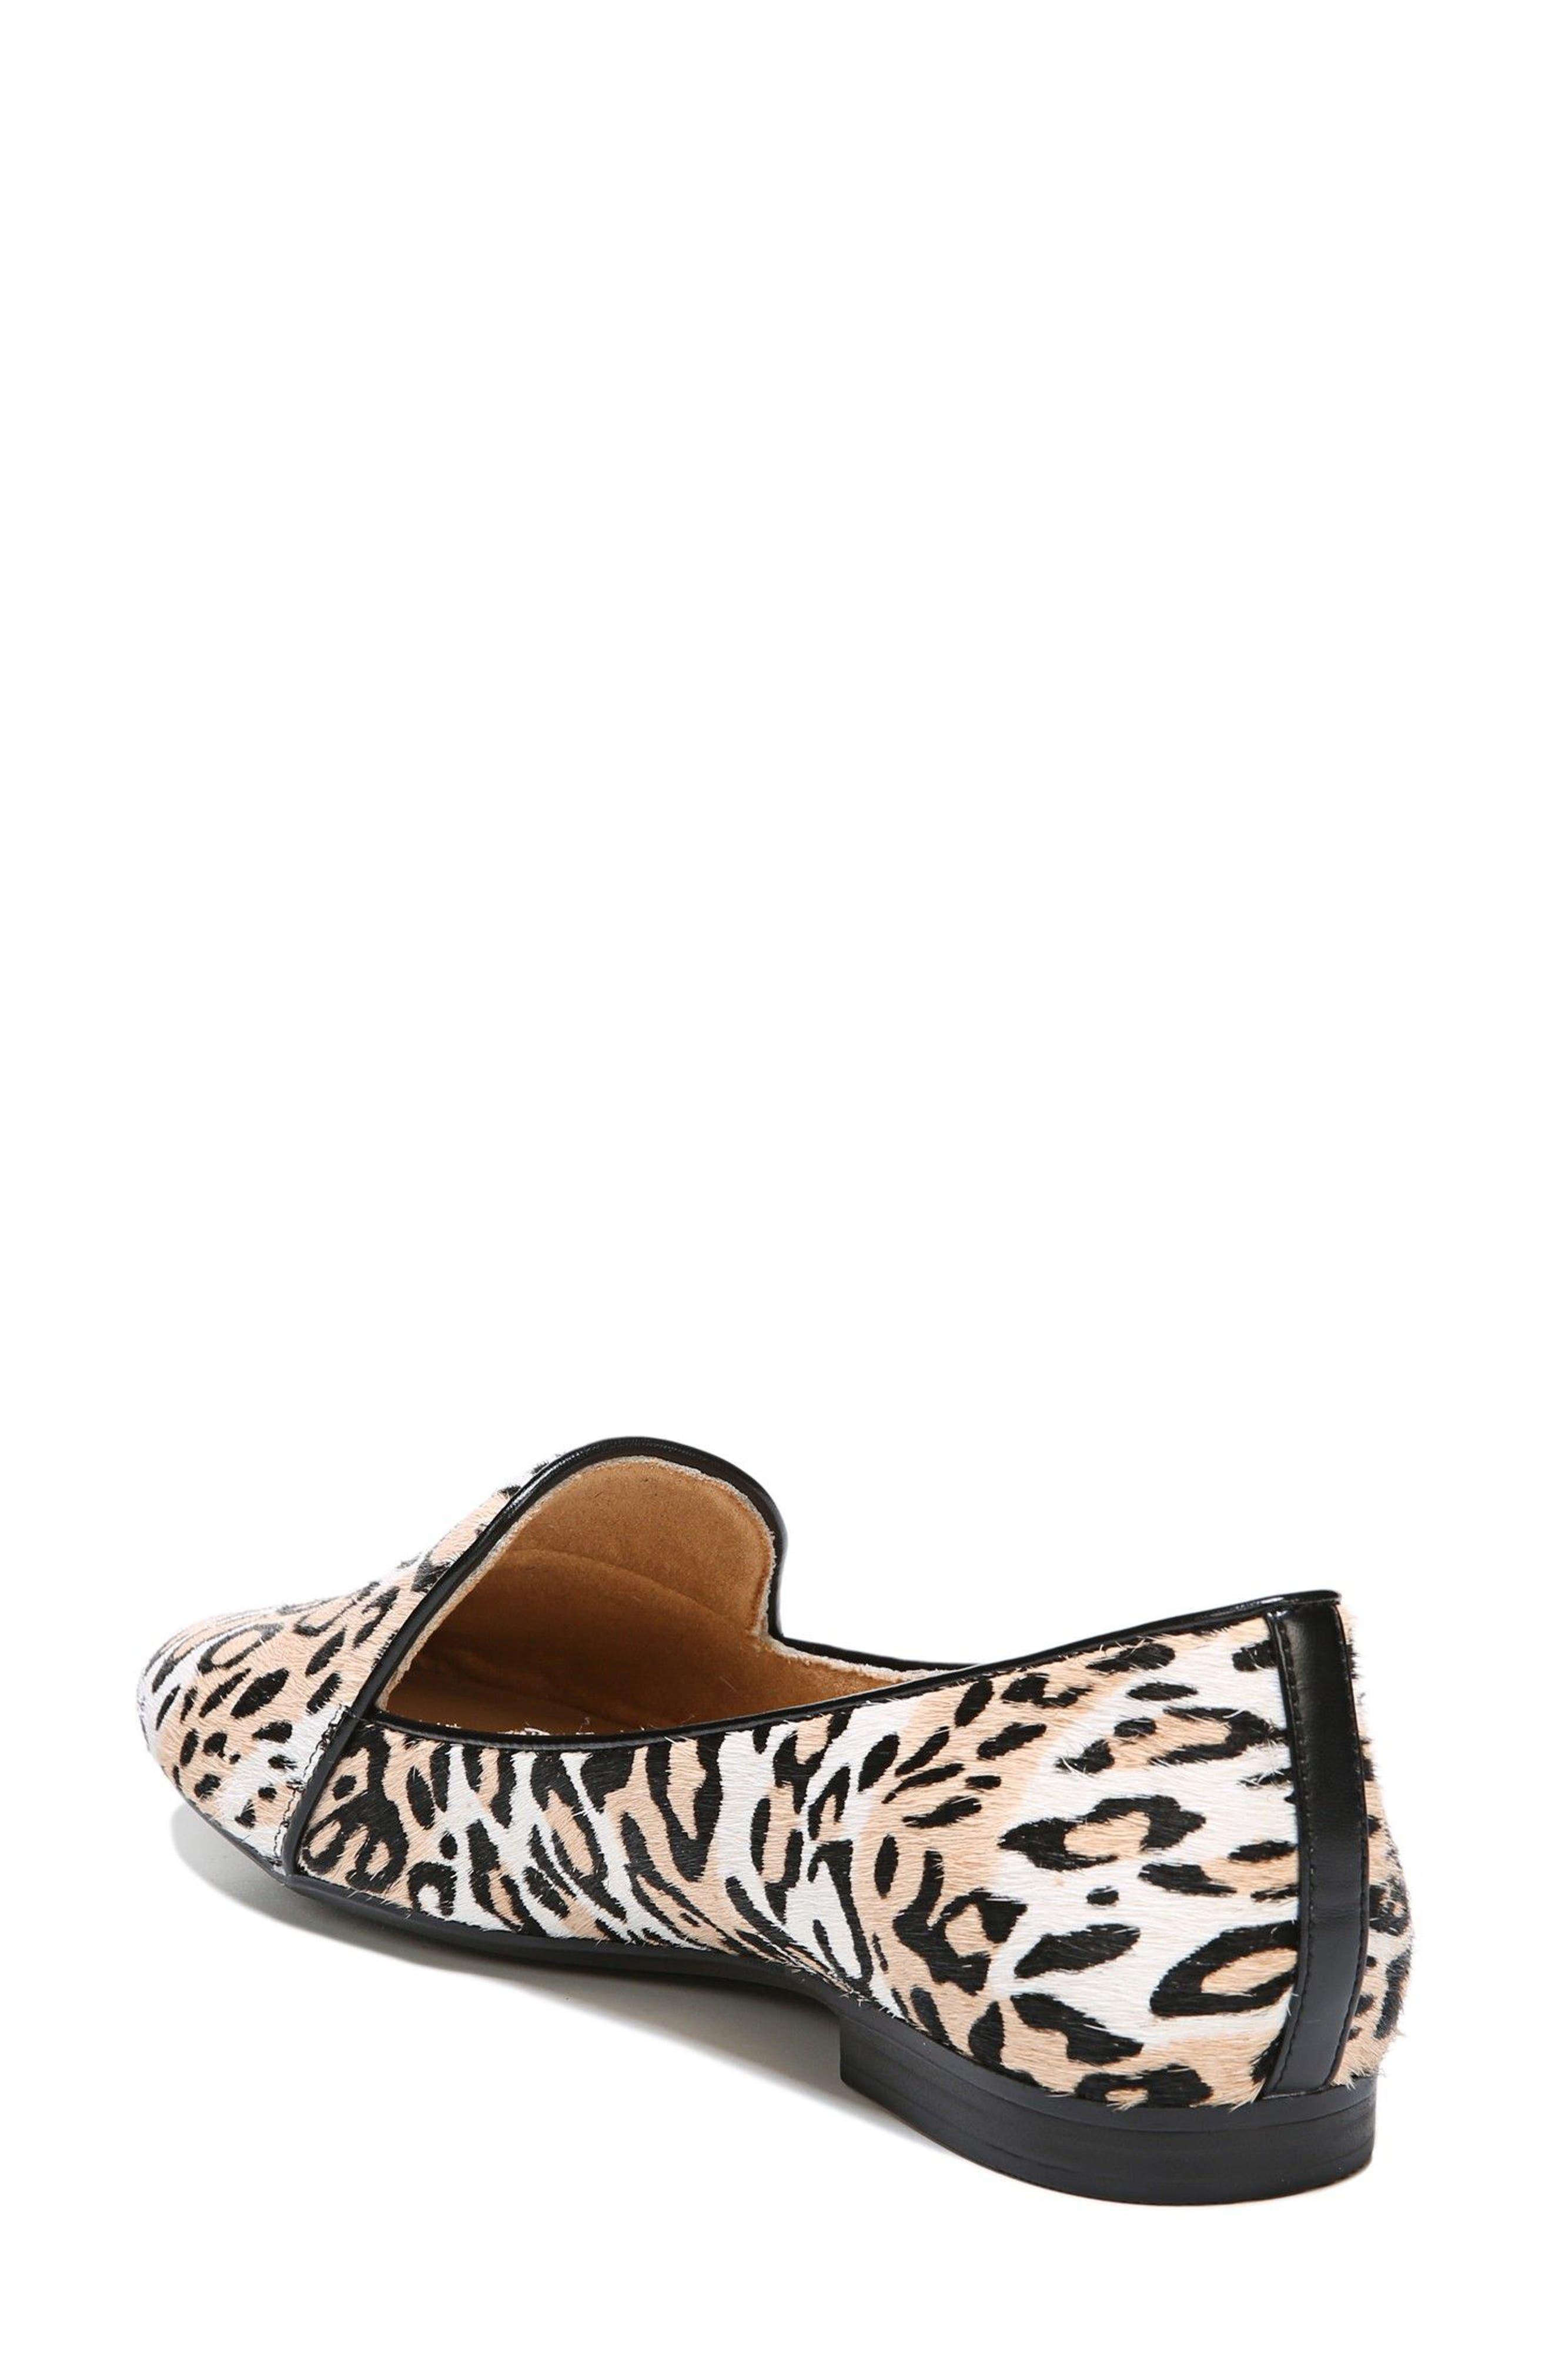 Emiline 2 Loafer,                             Alternate thumbnail 2, color,                             Cheetah Brahma Hair